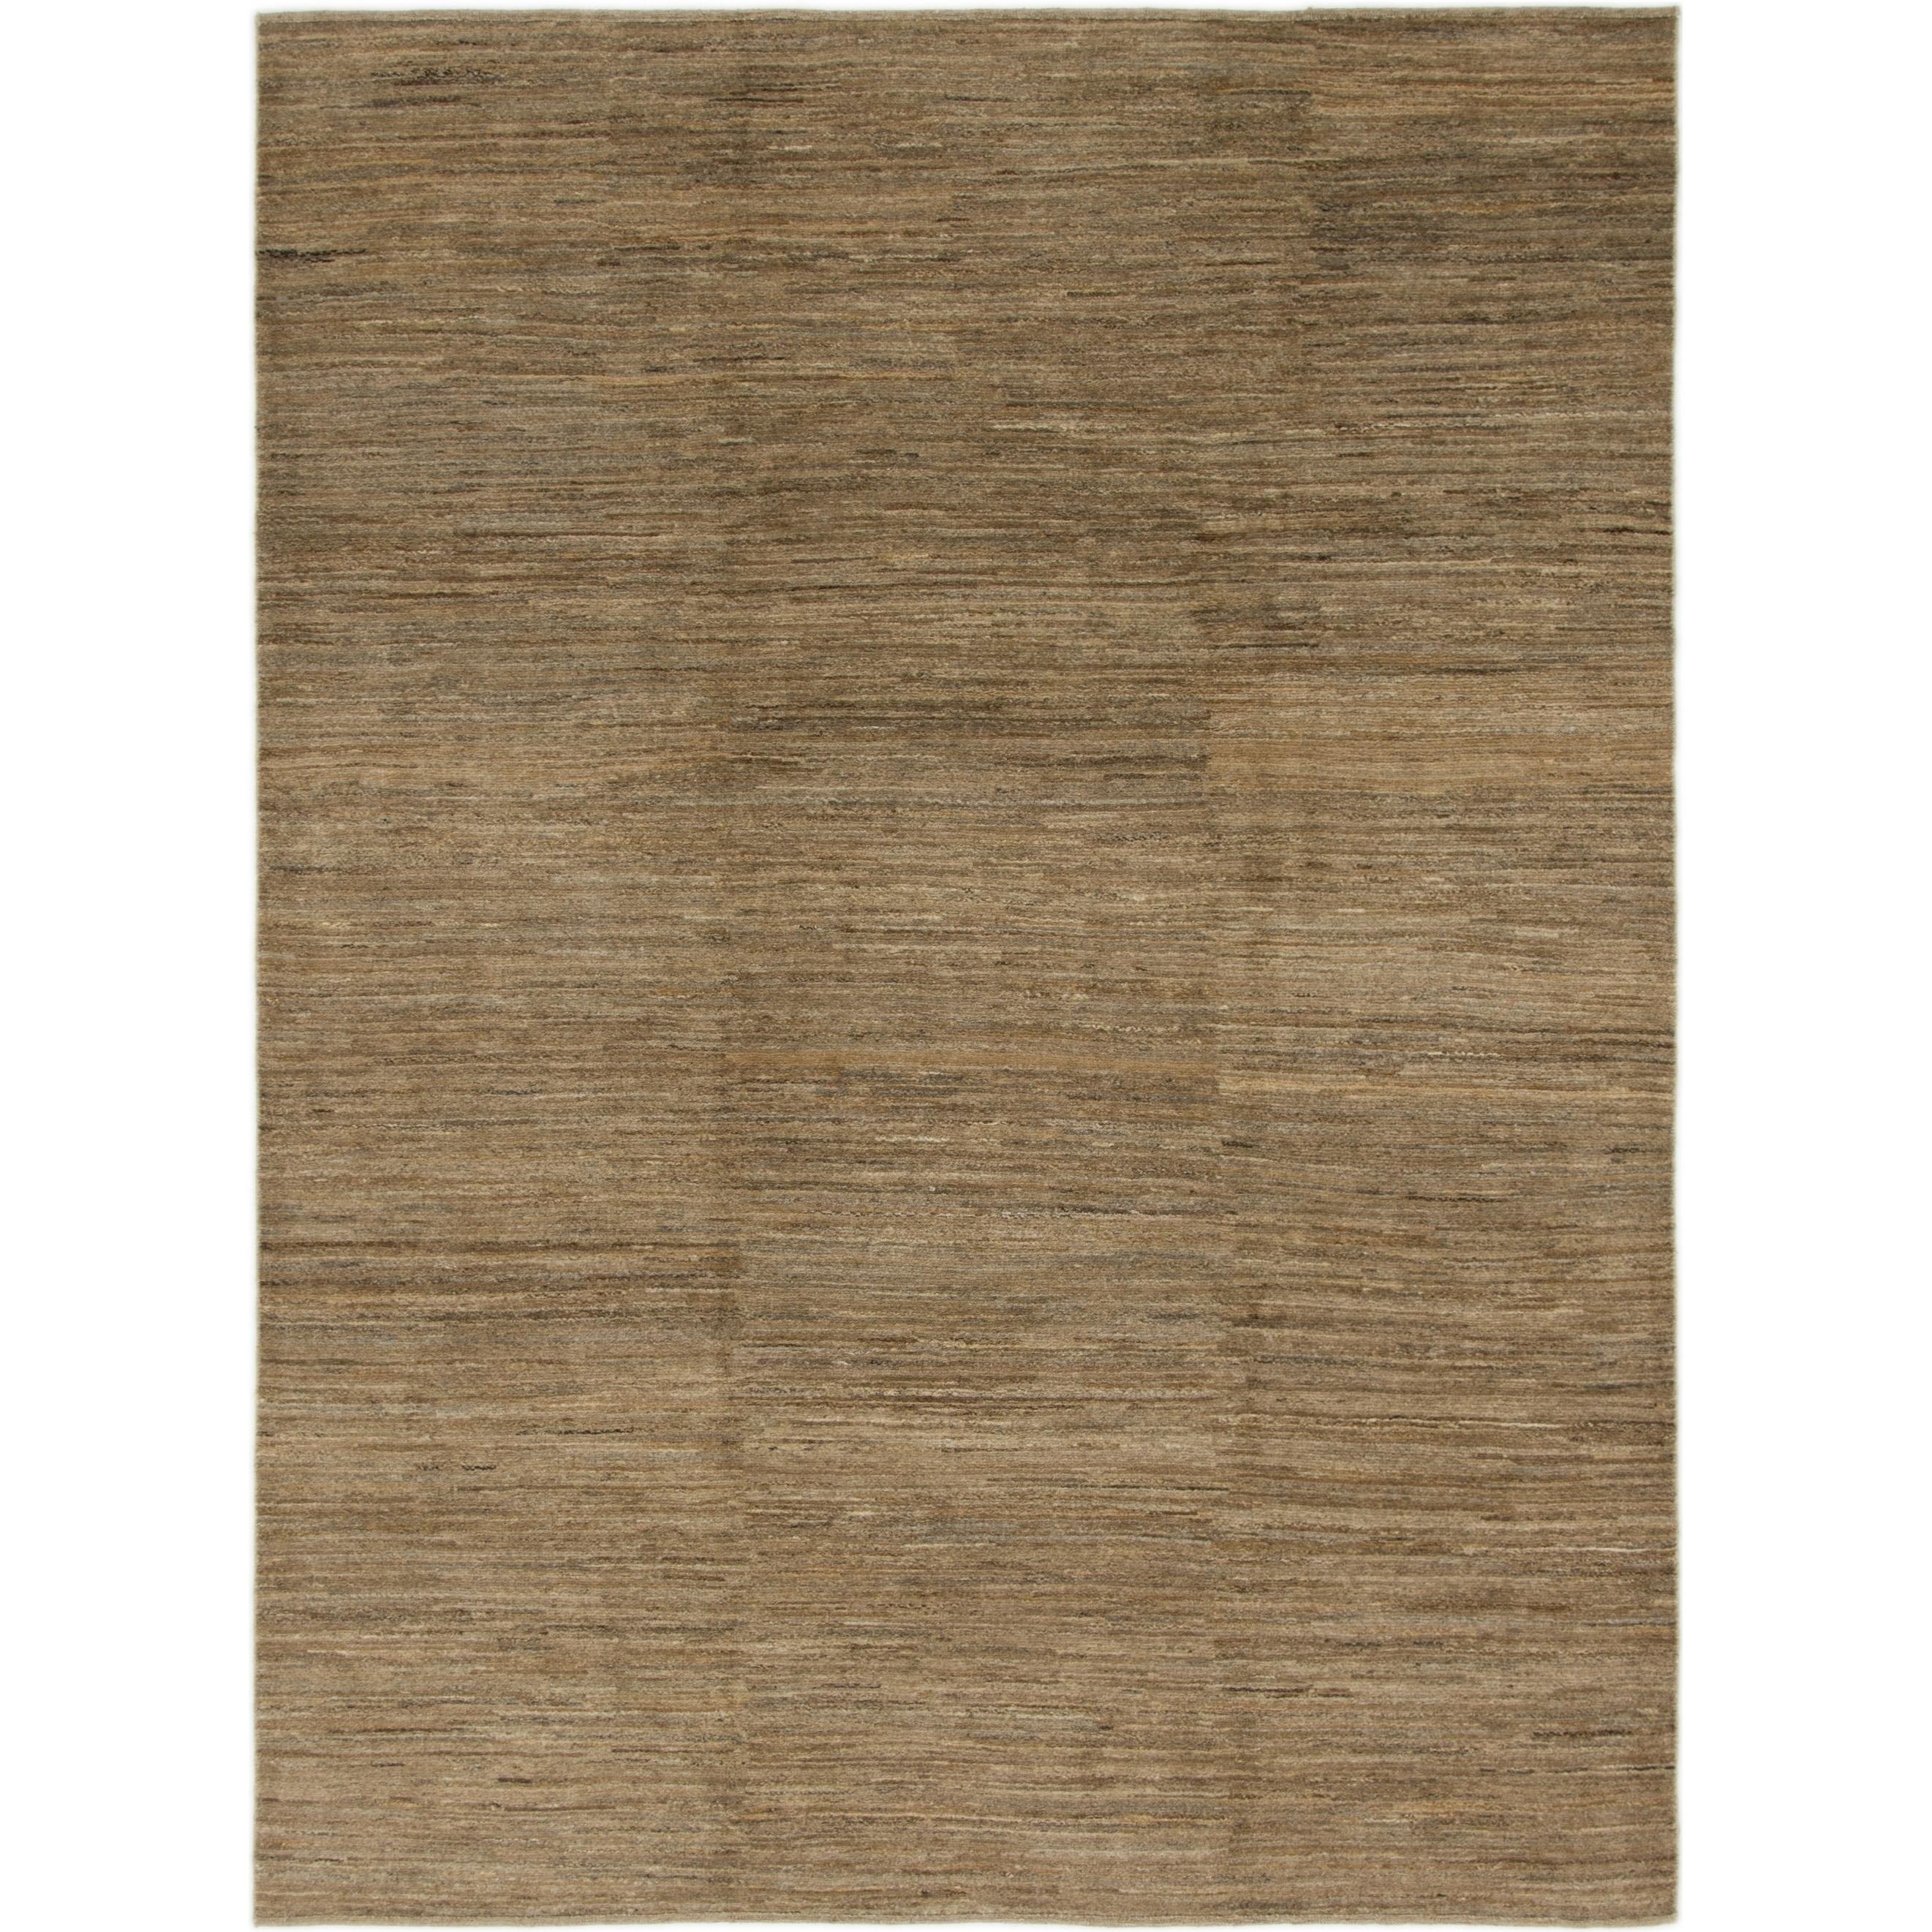 Hand Knotted Kashkuli Gabbeh Wool Area Rug - 6 9 x 9 3 (Light brown - 6 9 x 9 3)